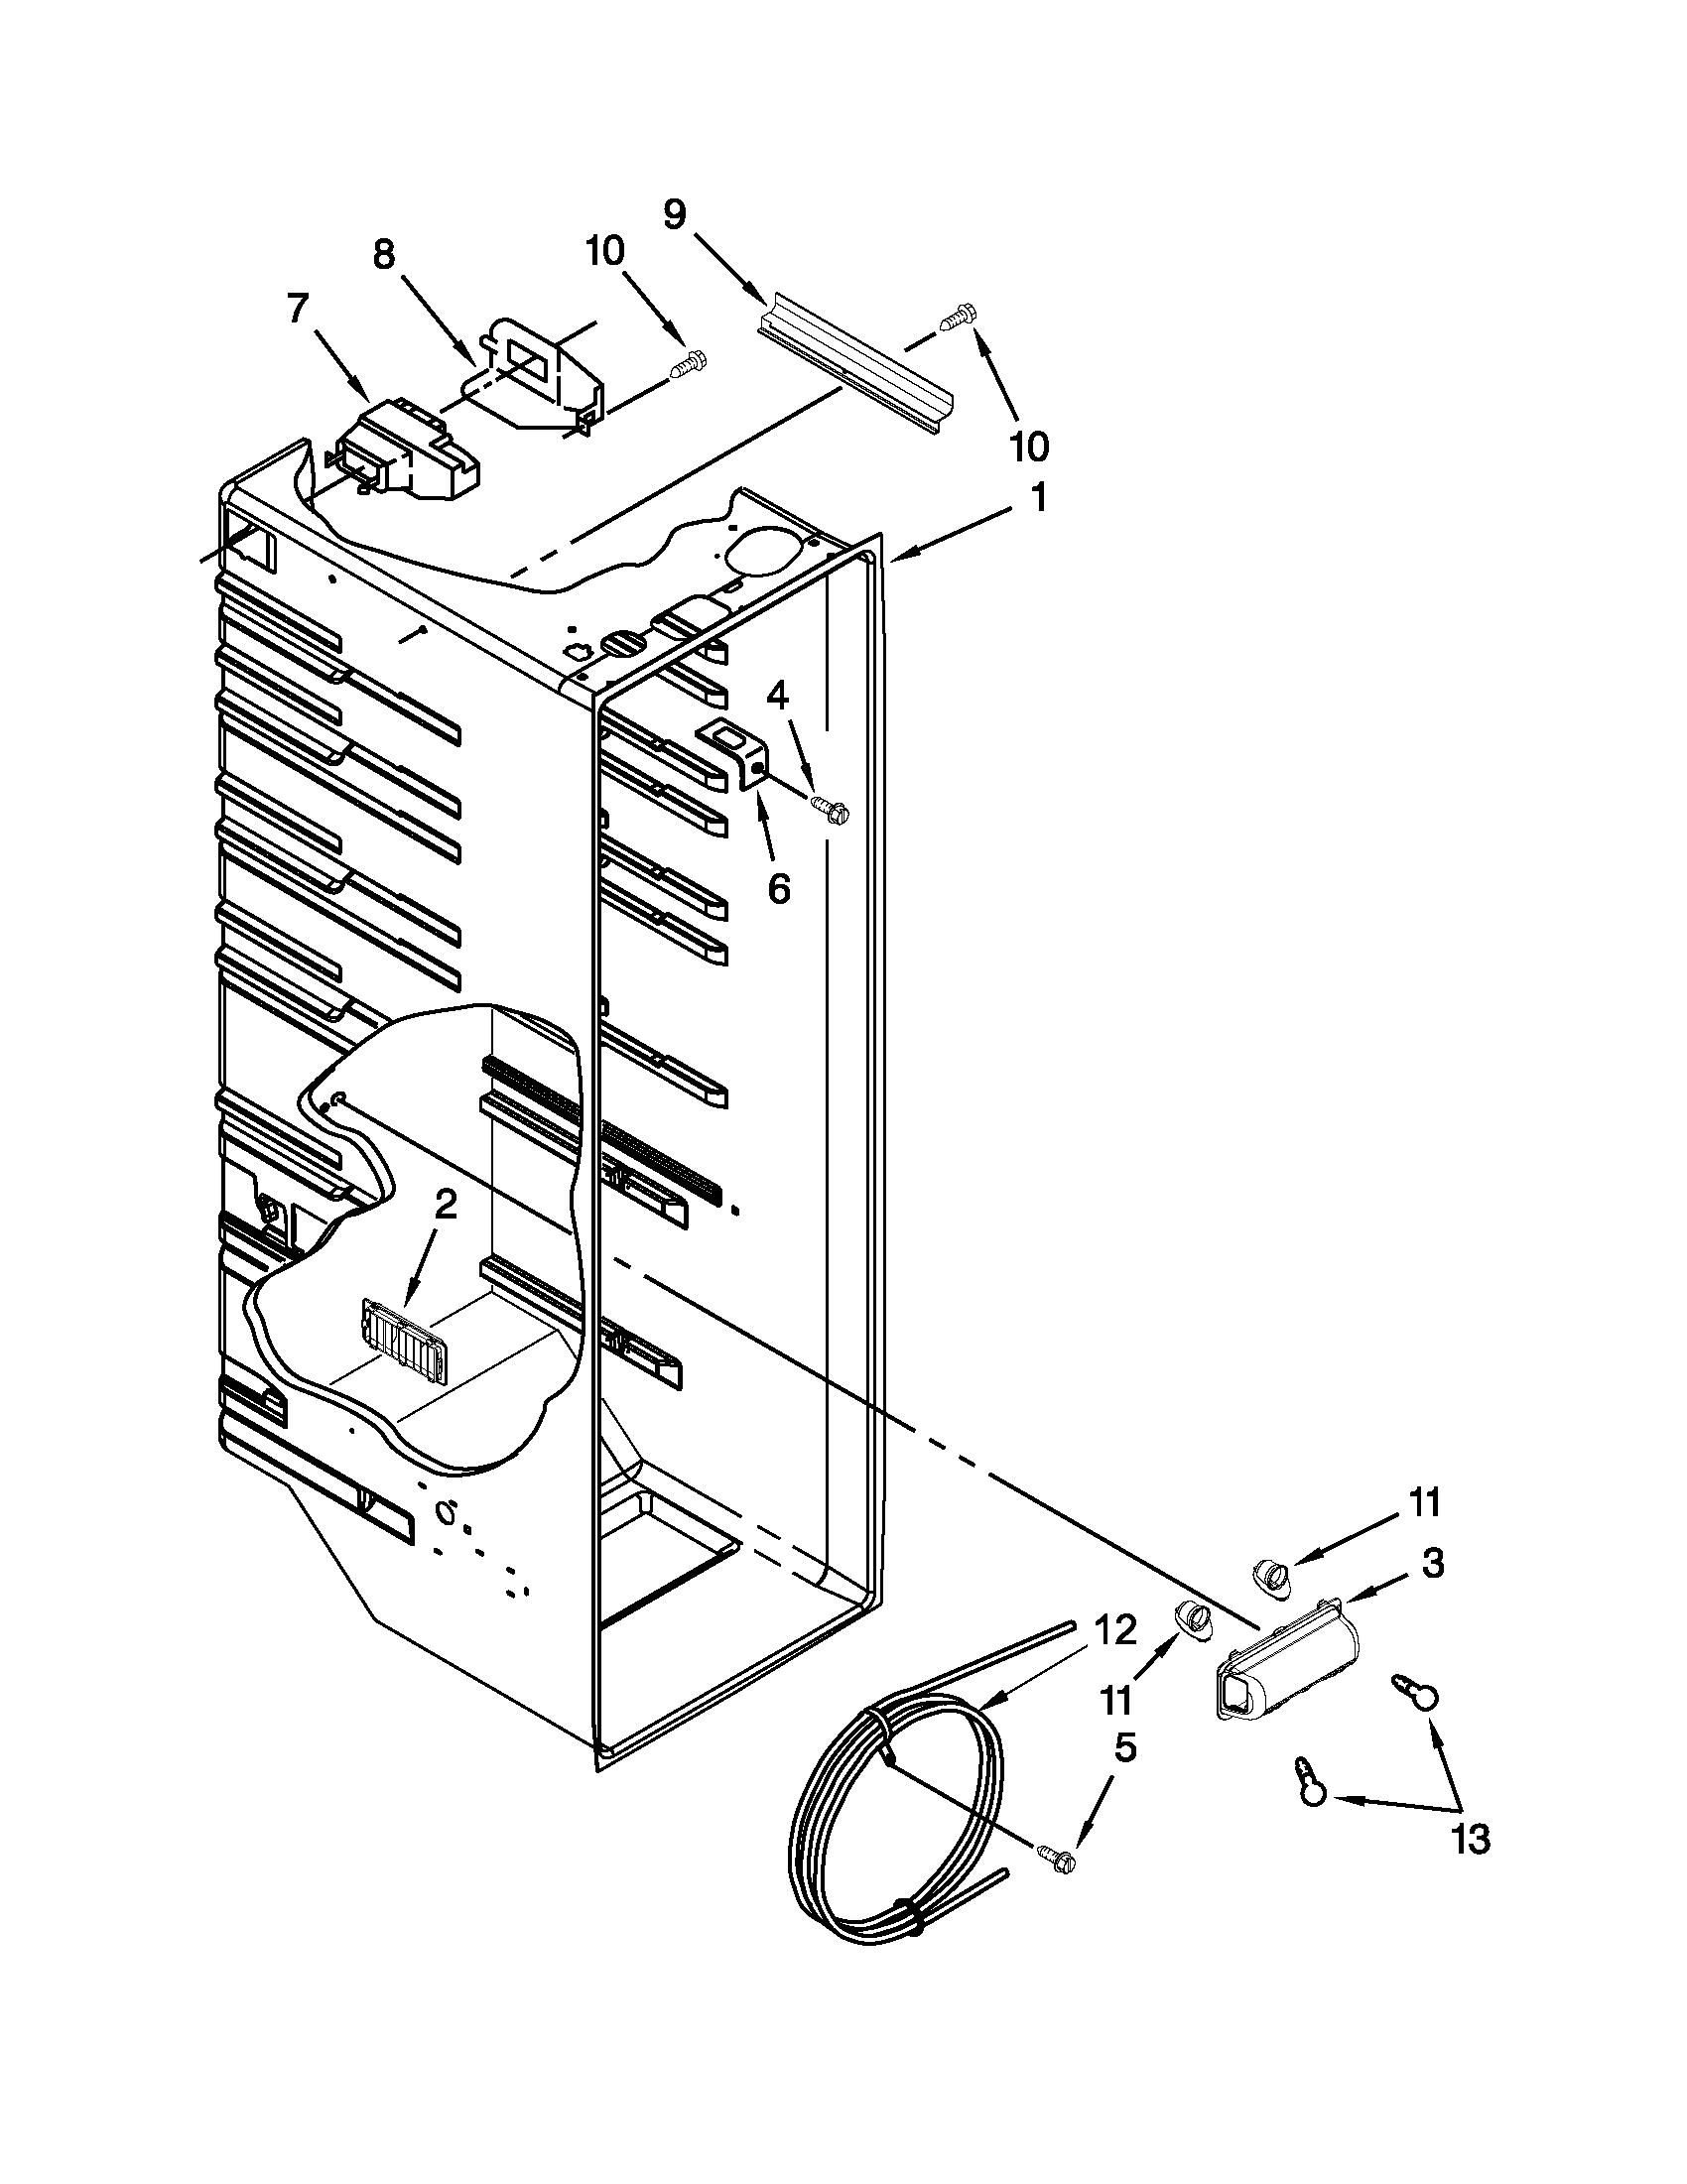 Whirlpool model ED2VHEXVQ01 side-by-side refrigerator